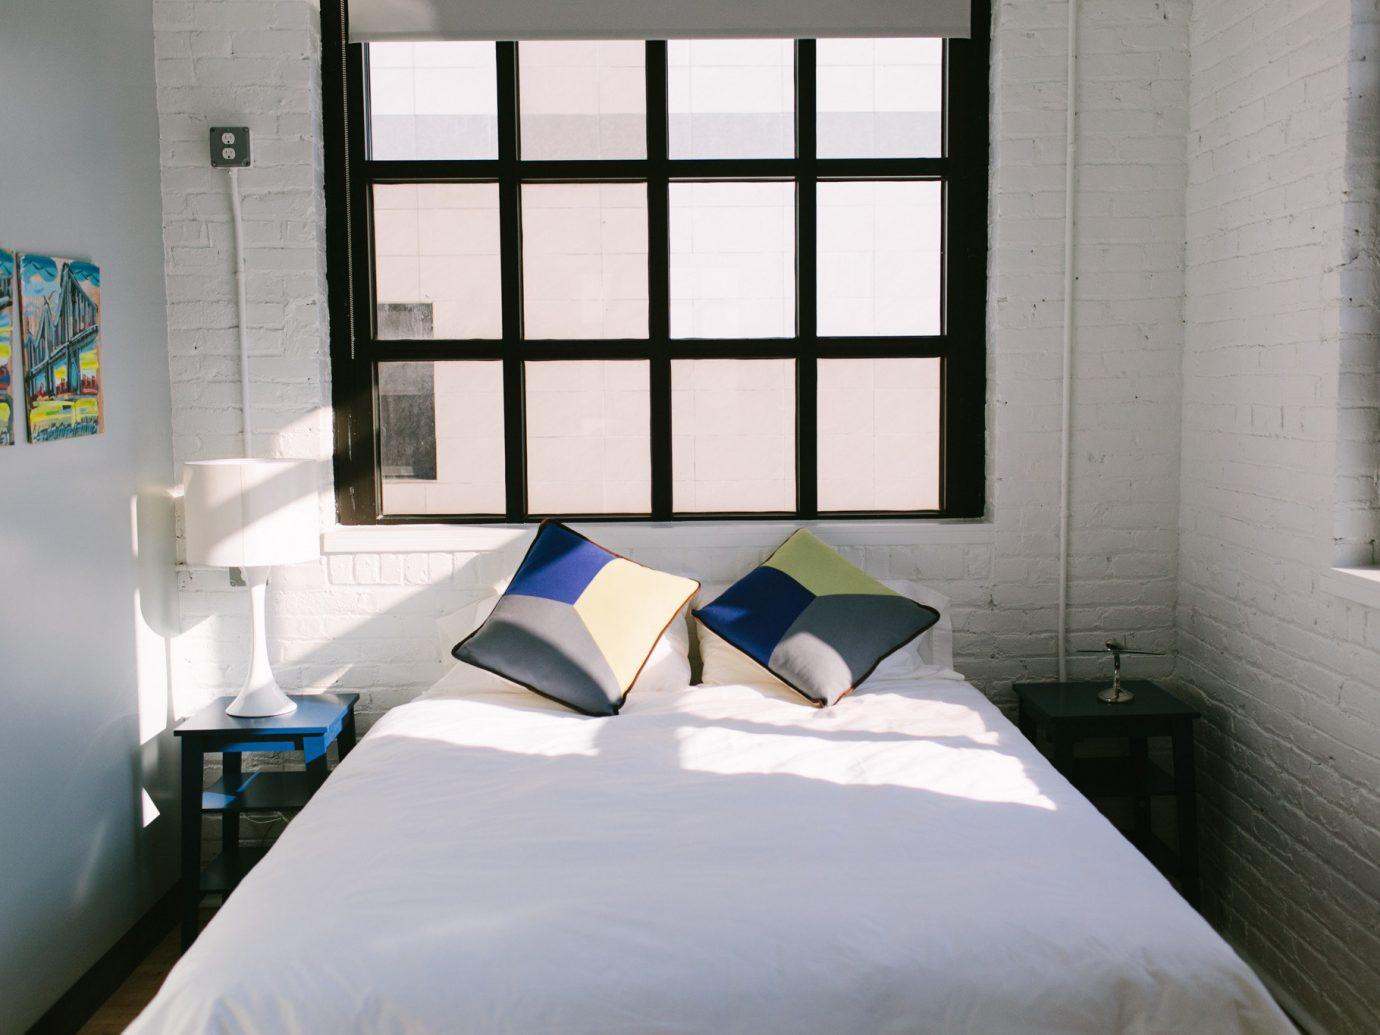 Hotels bed indoor wall window room property Bedroom building interior design white Design furniture pillow apartment Suite estate